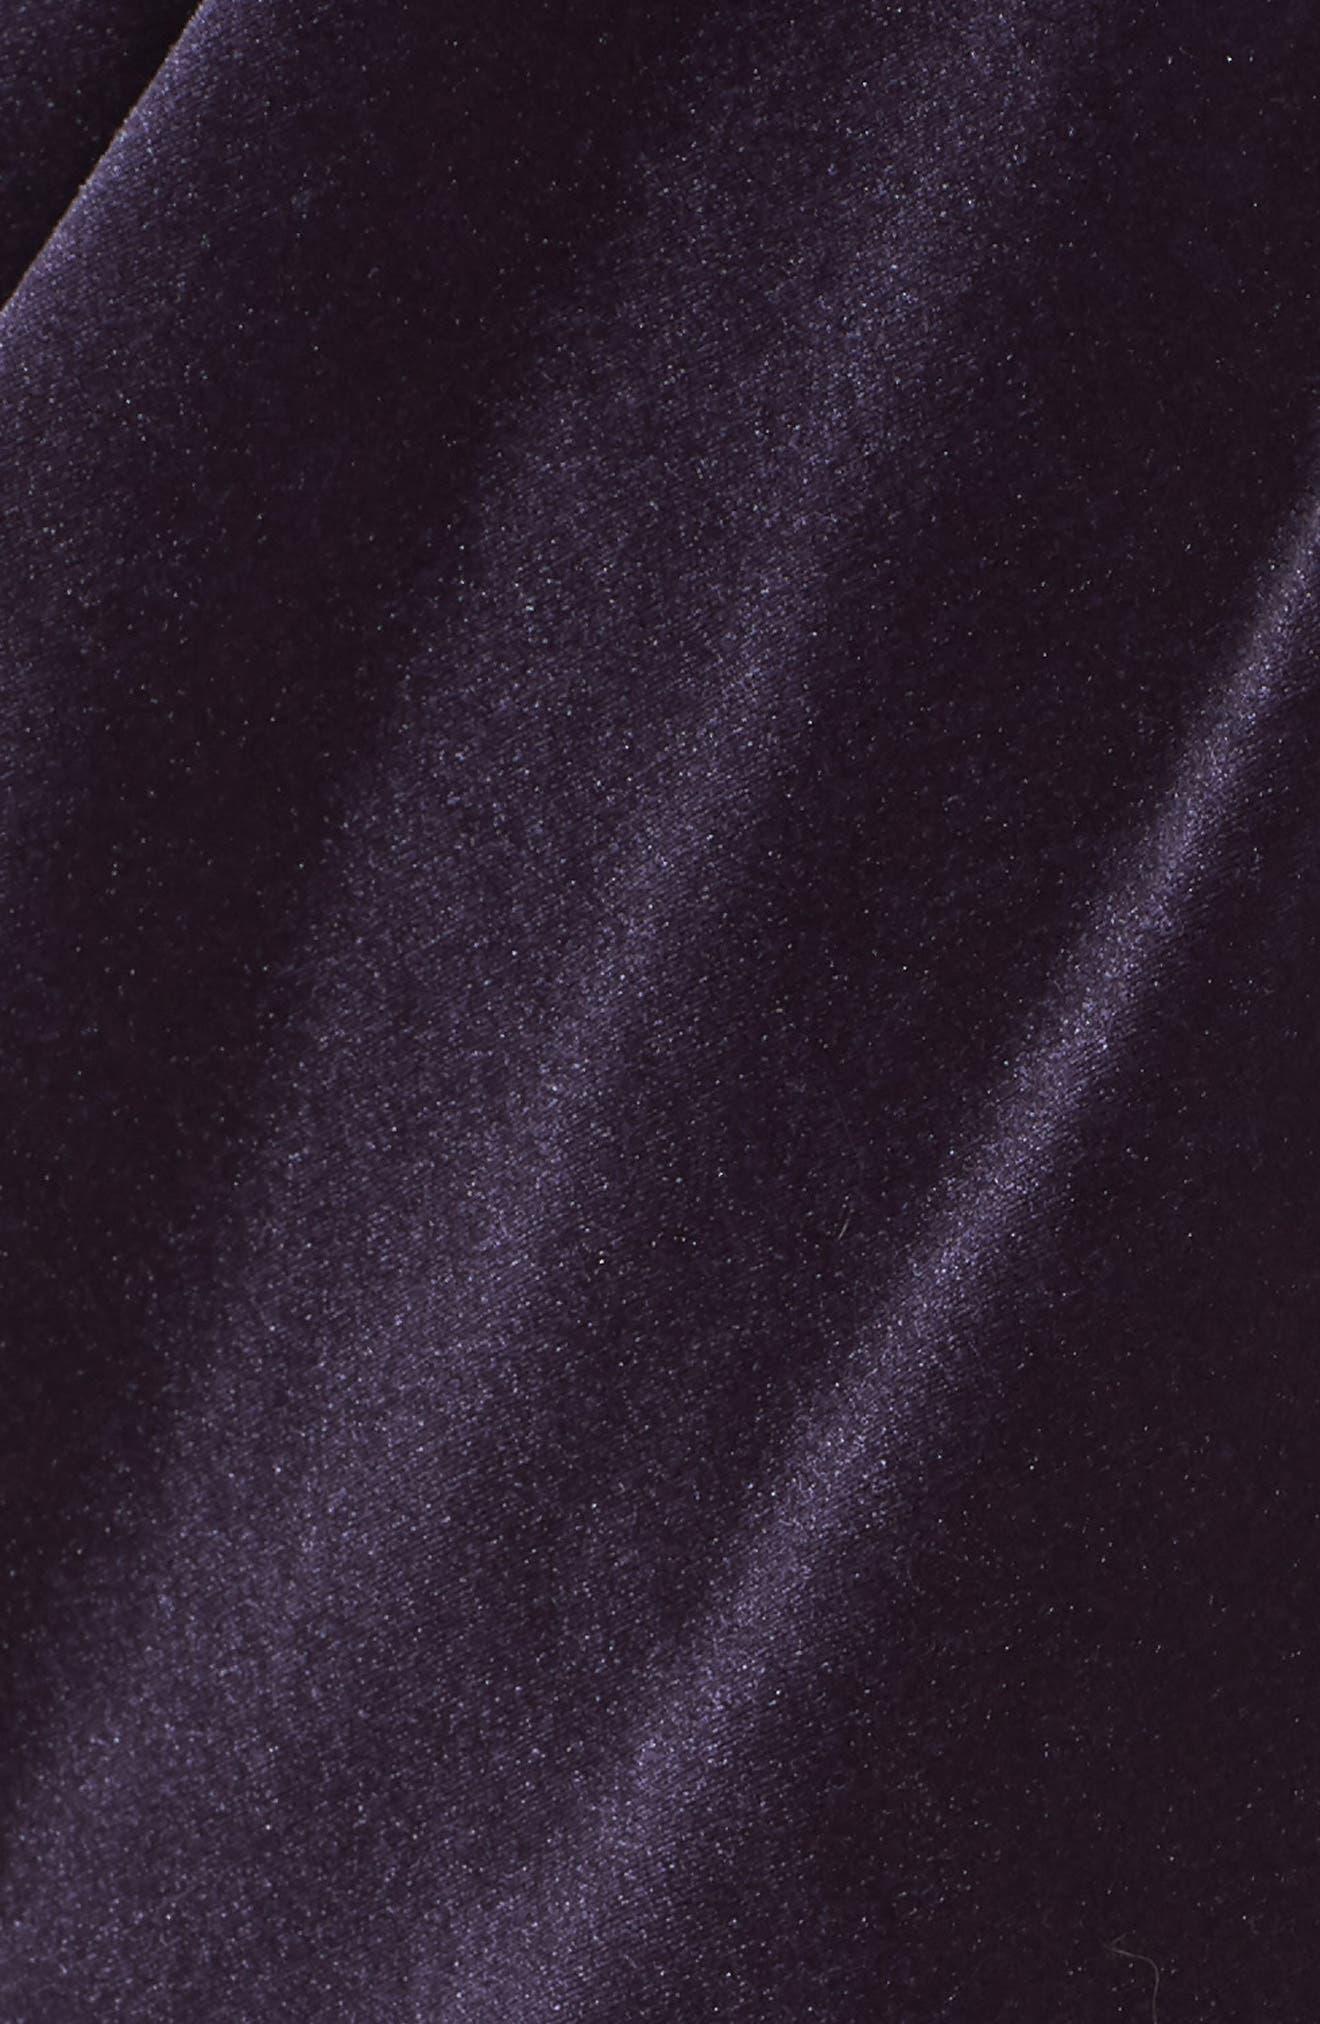 Alex Evening Velvet Sheath Dress,                             Alternate thumbnail 6, color,                             AMETHYST